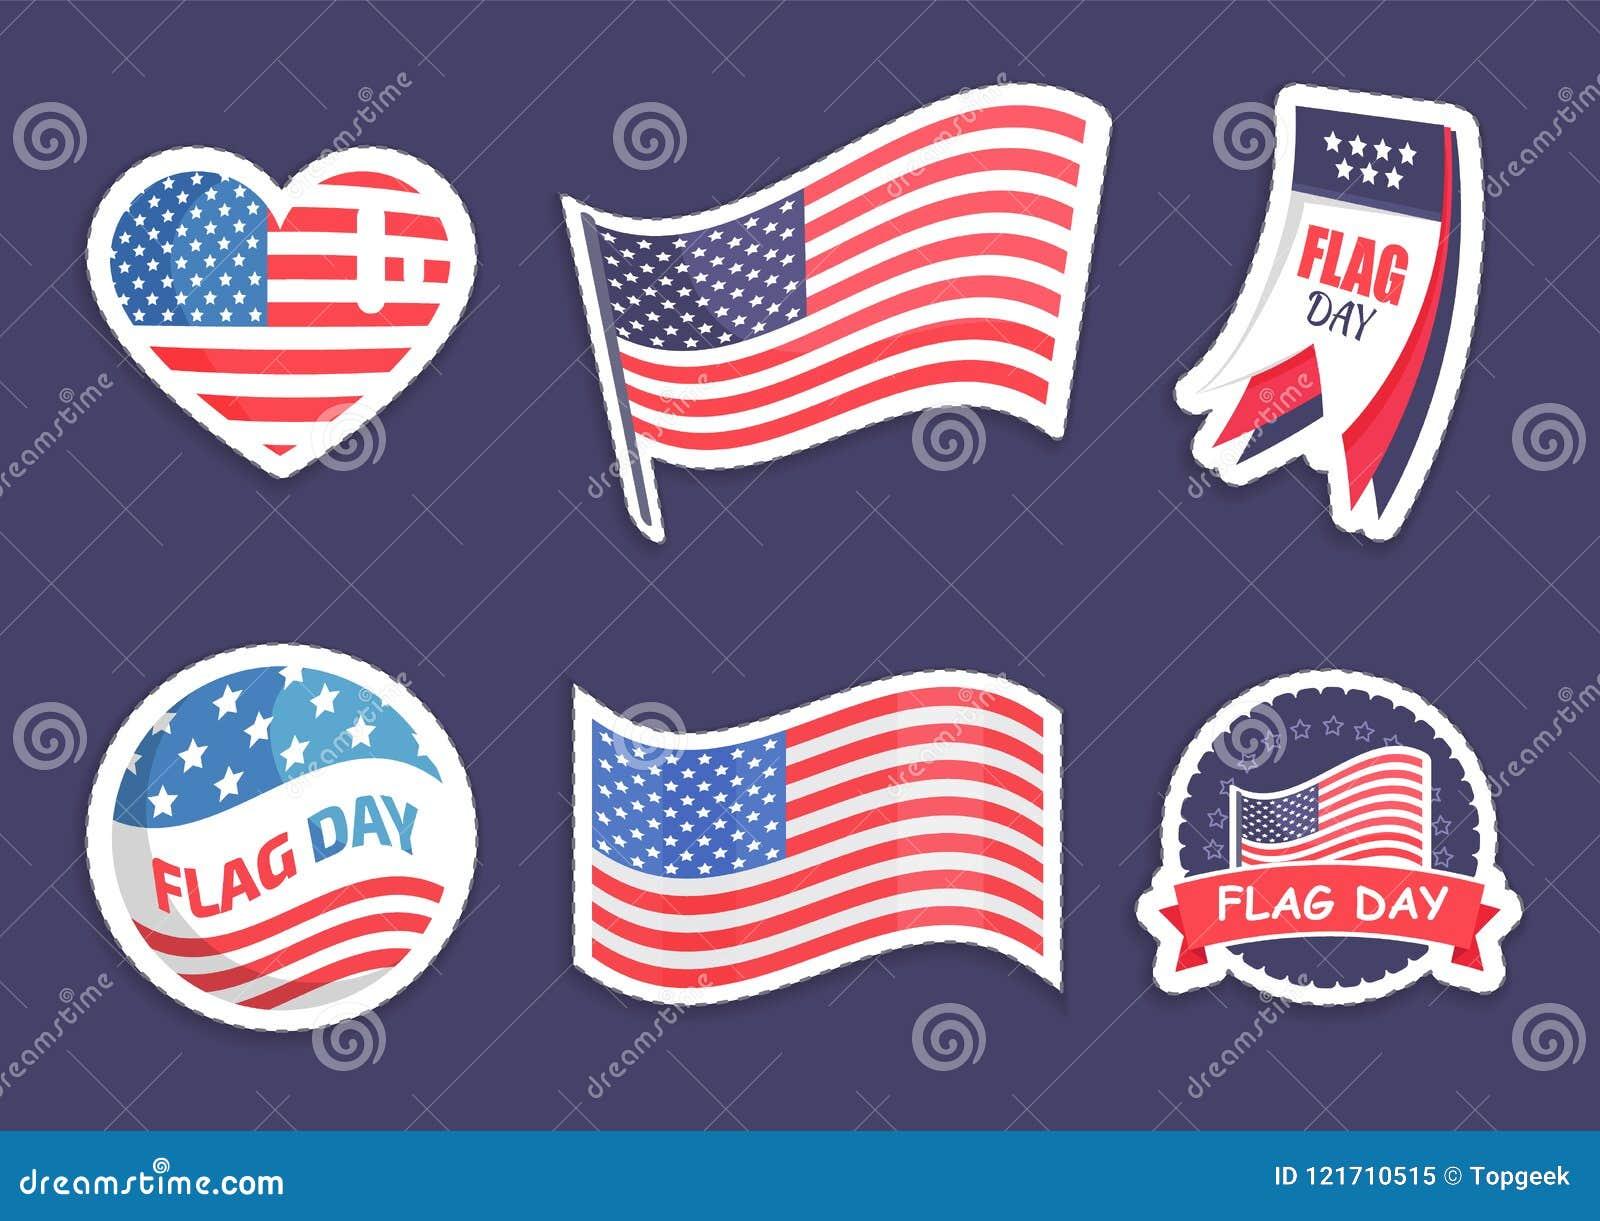 Flag Celebration Collection Vector Illustration Stock Vector